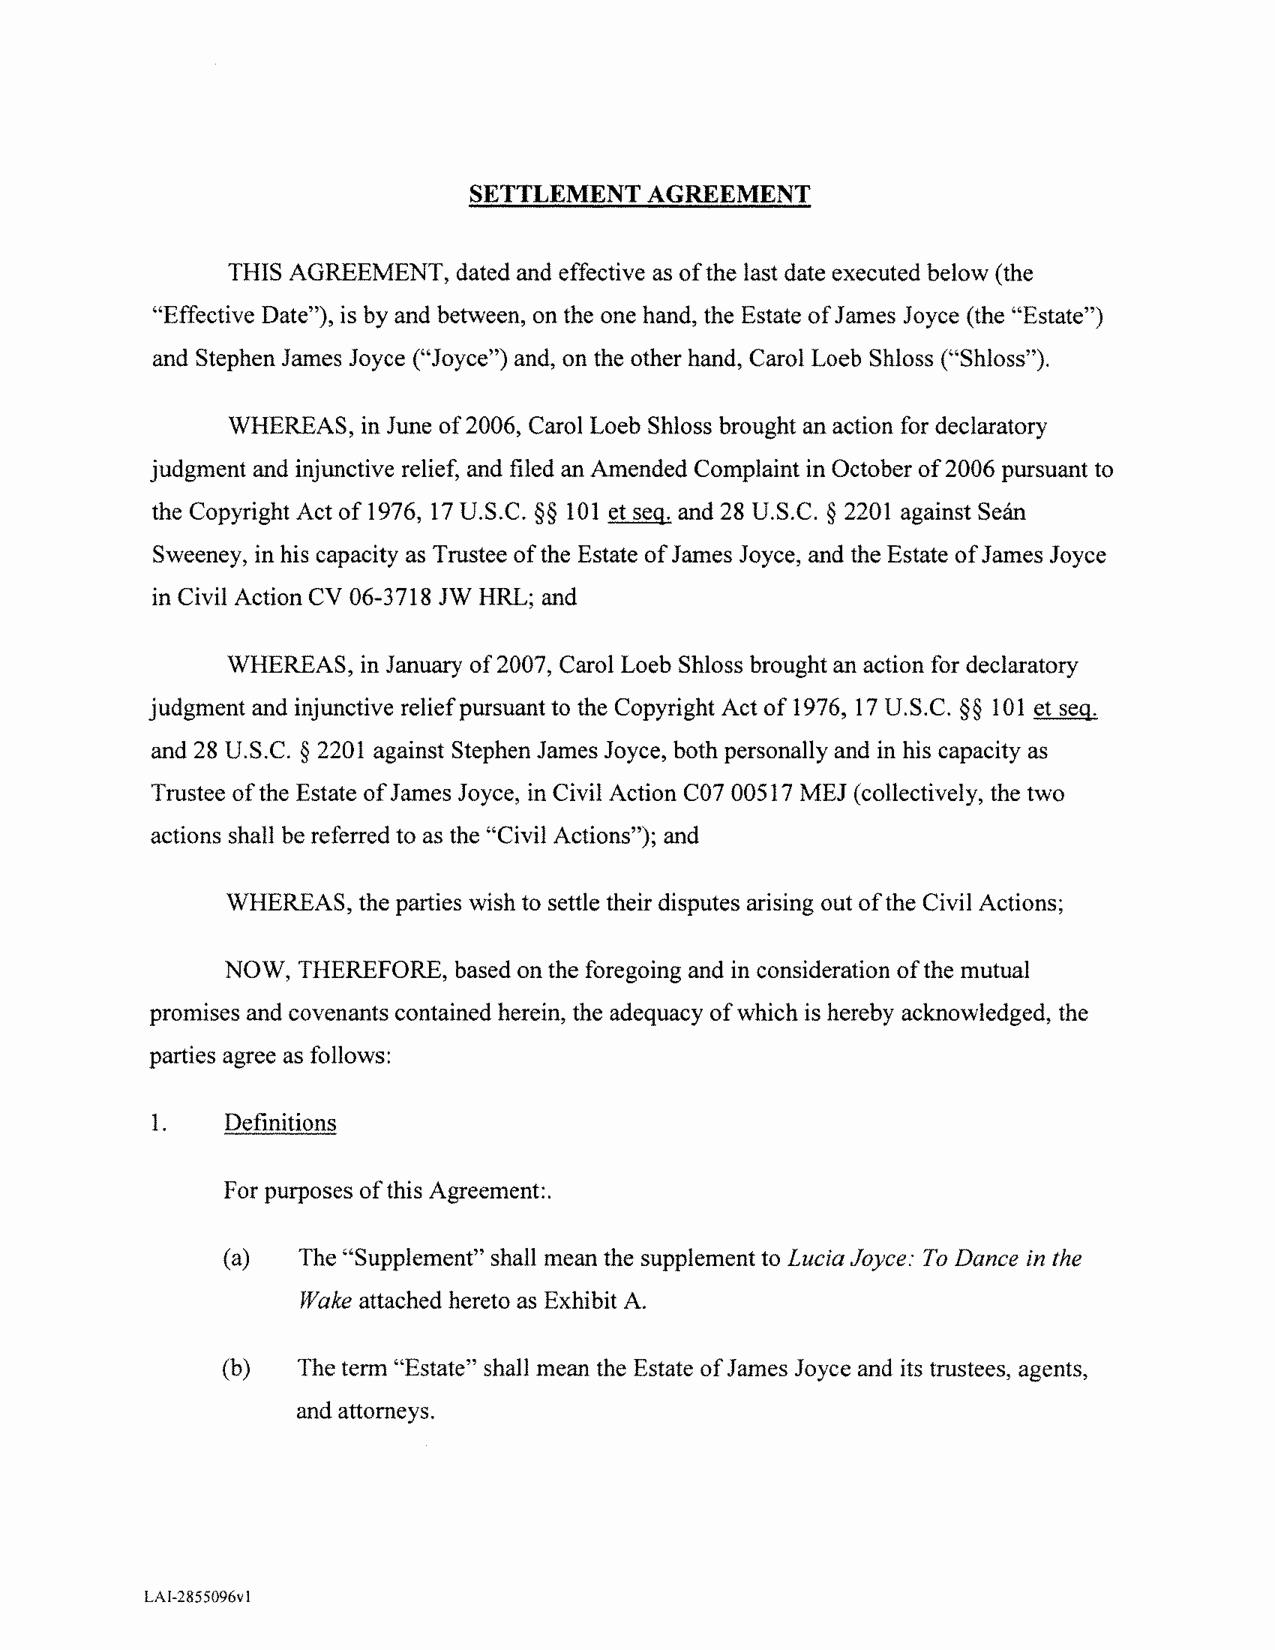 Car Accident Settlement Agreement form Inspirational Sample Mediation Settlement Agreement Nice Agreement